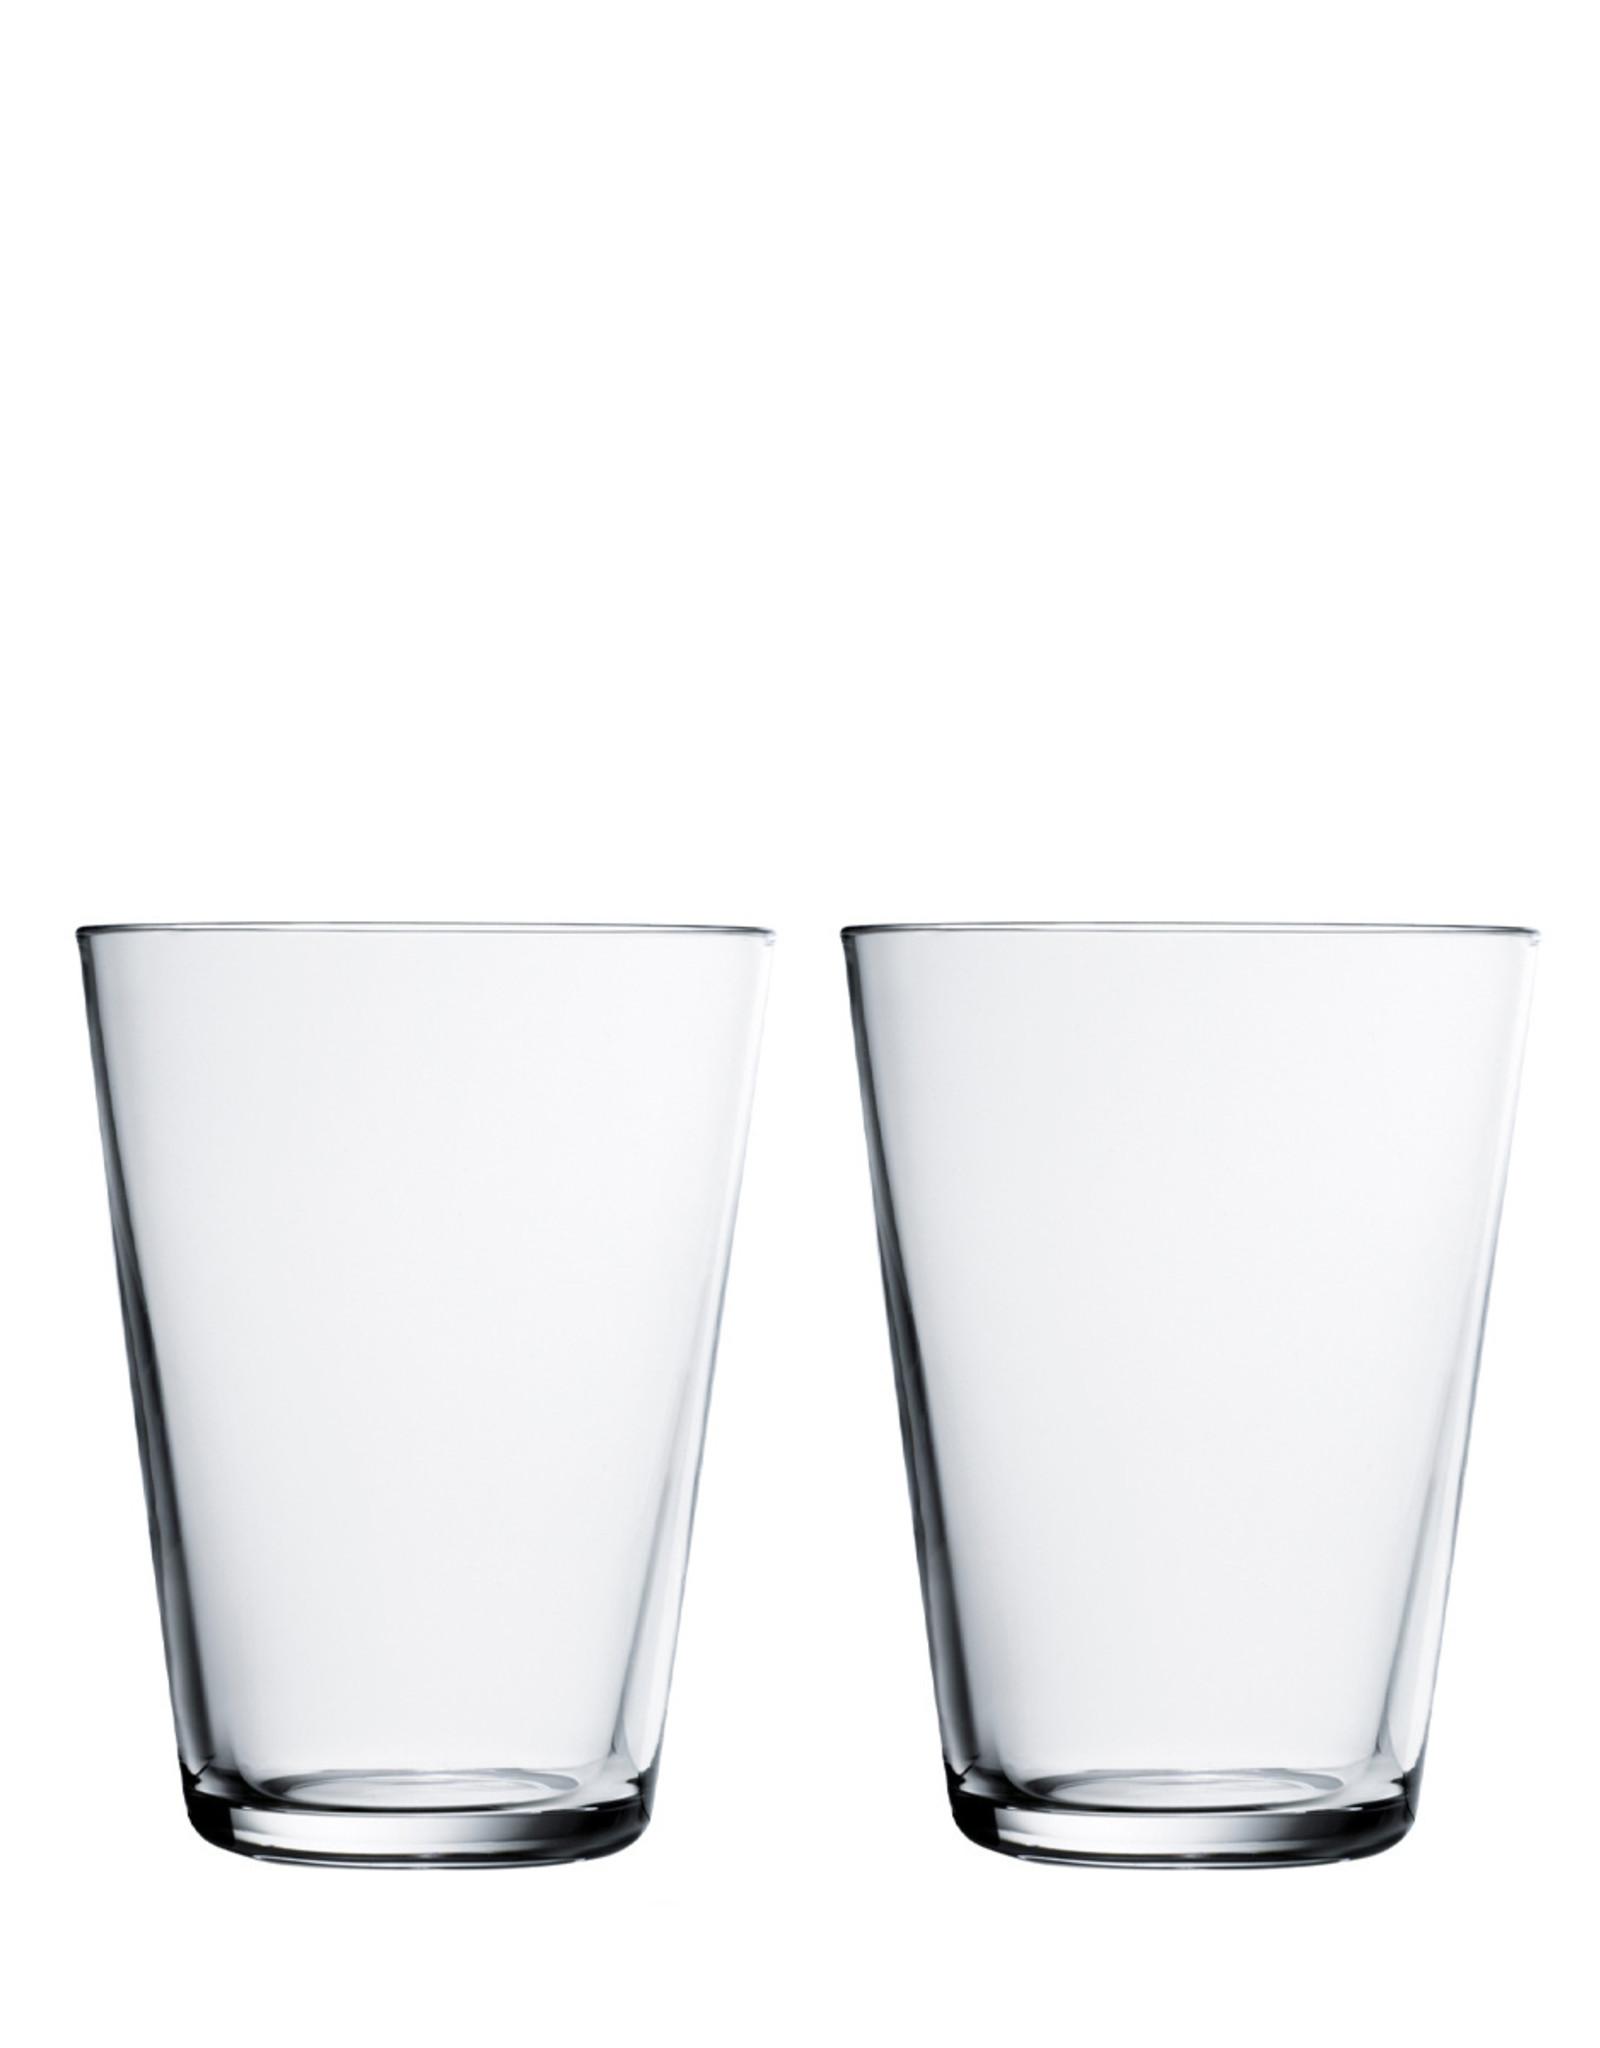 Iittala Iittala Kartio Glas - 40 cl - Helder - 2 stuks